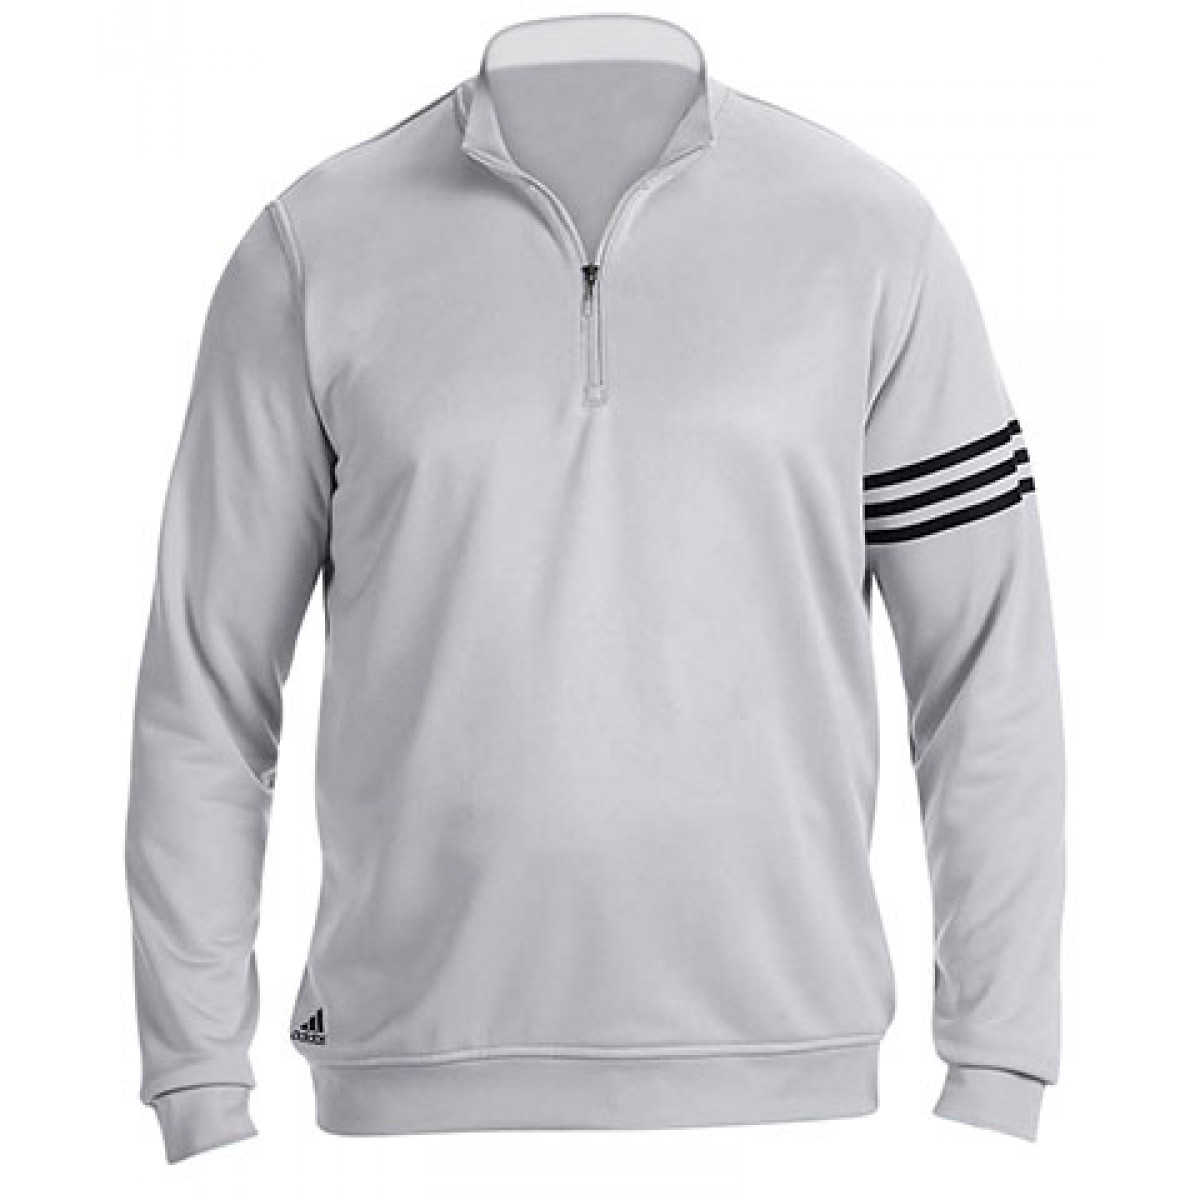 Adidas Men's 3-Stripes Pullover-Gray -2XL